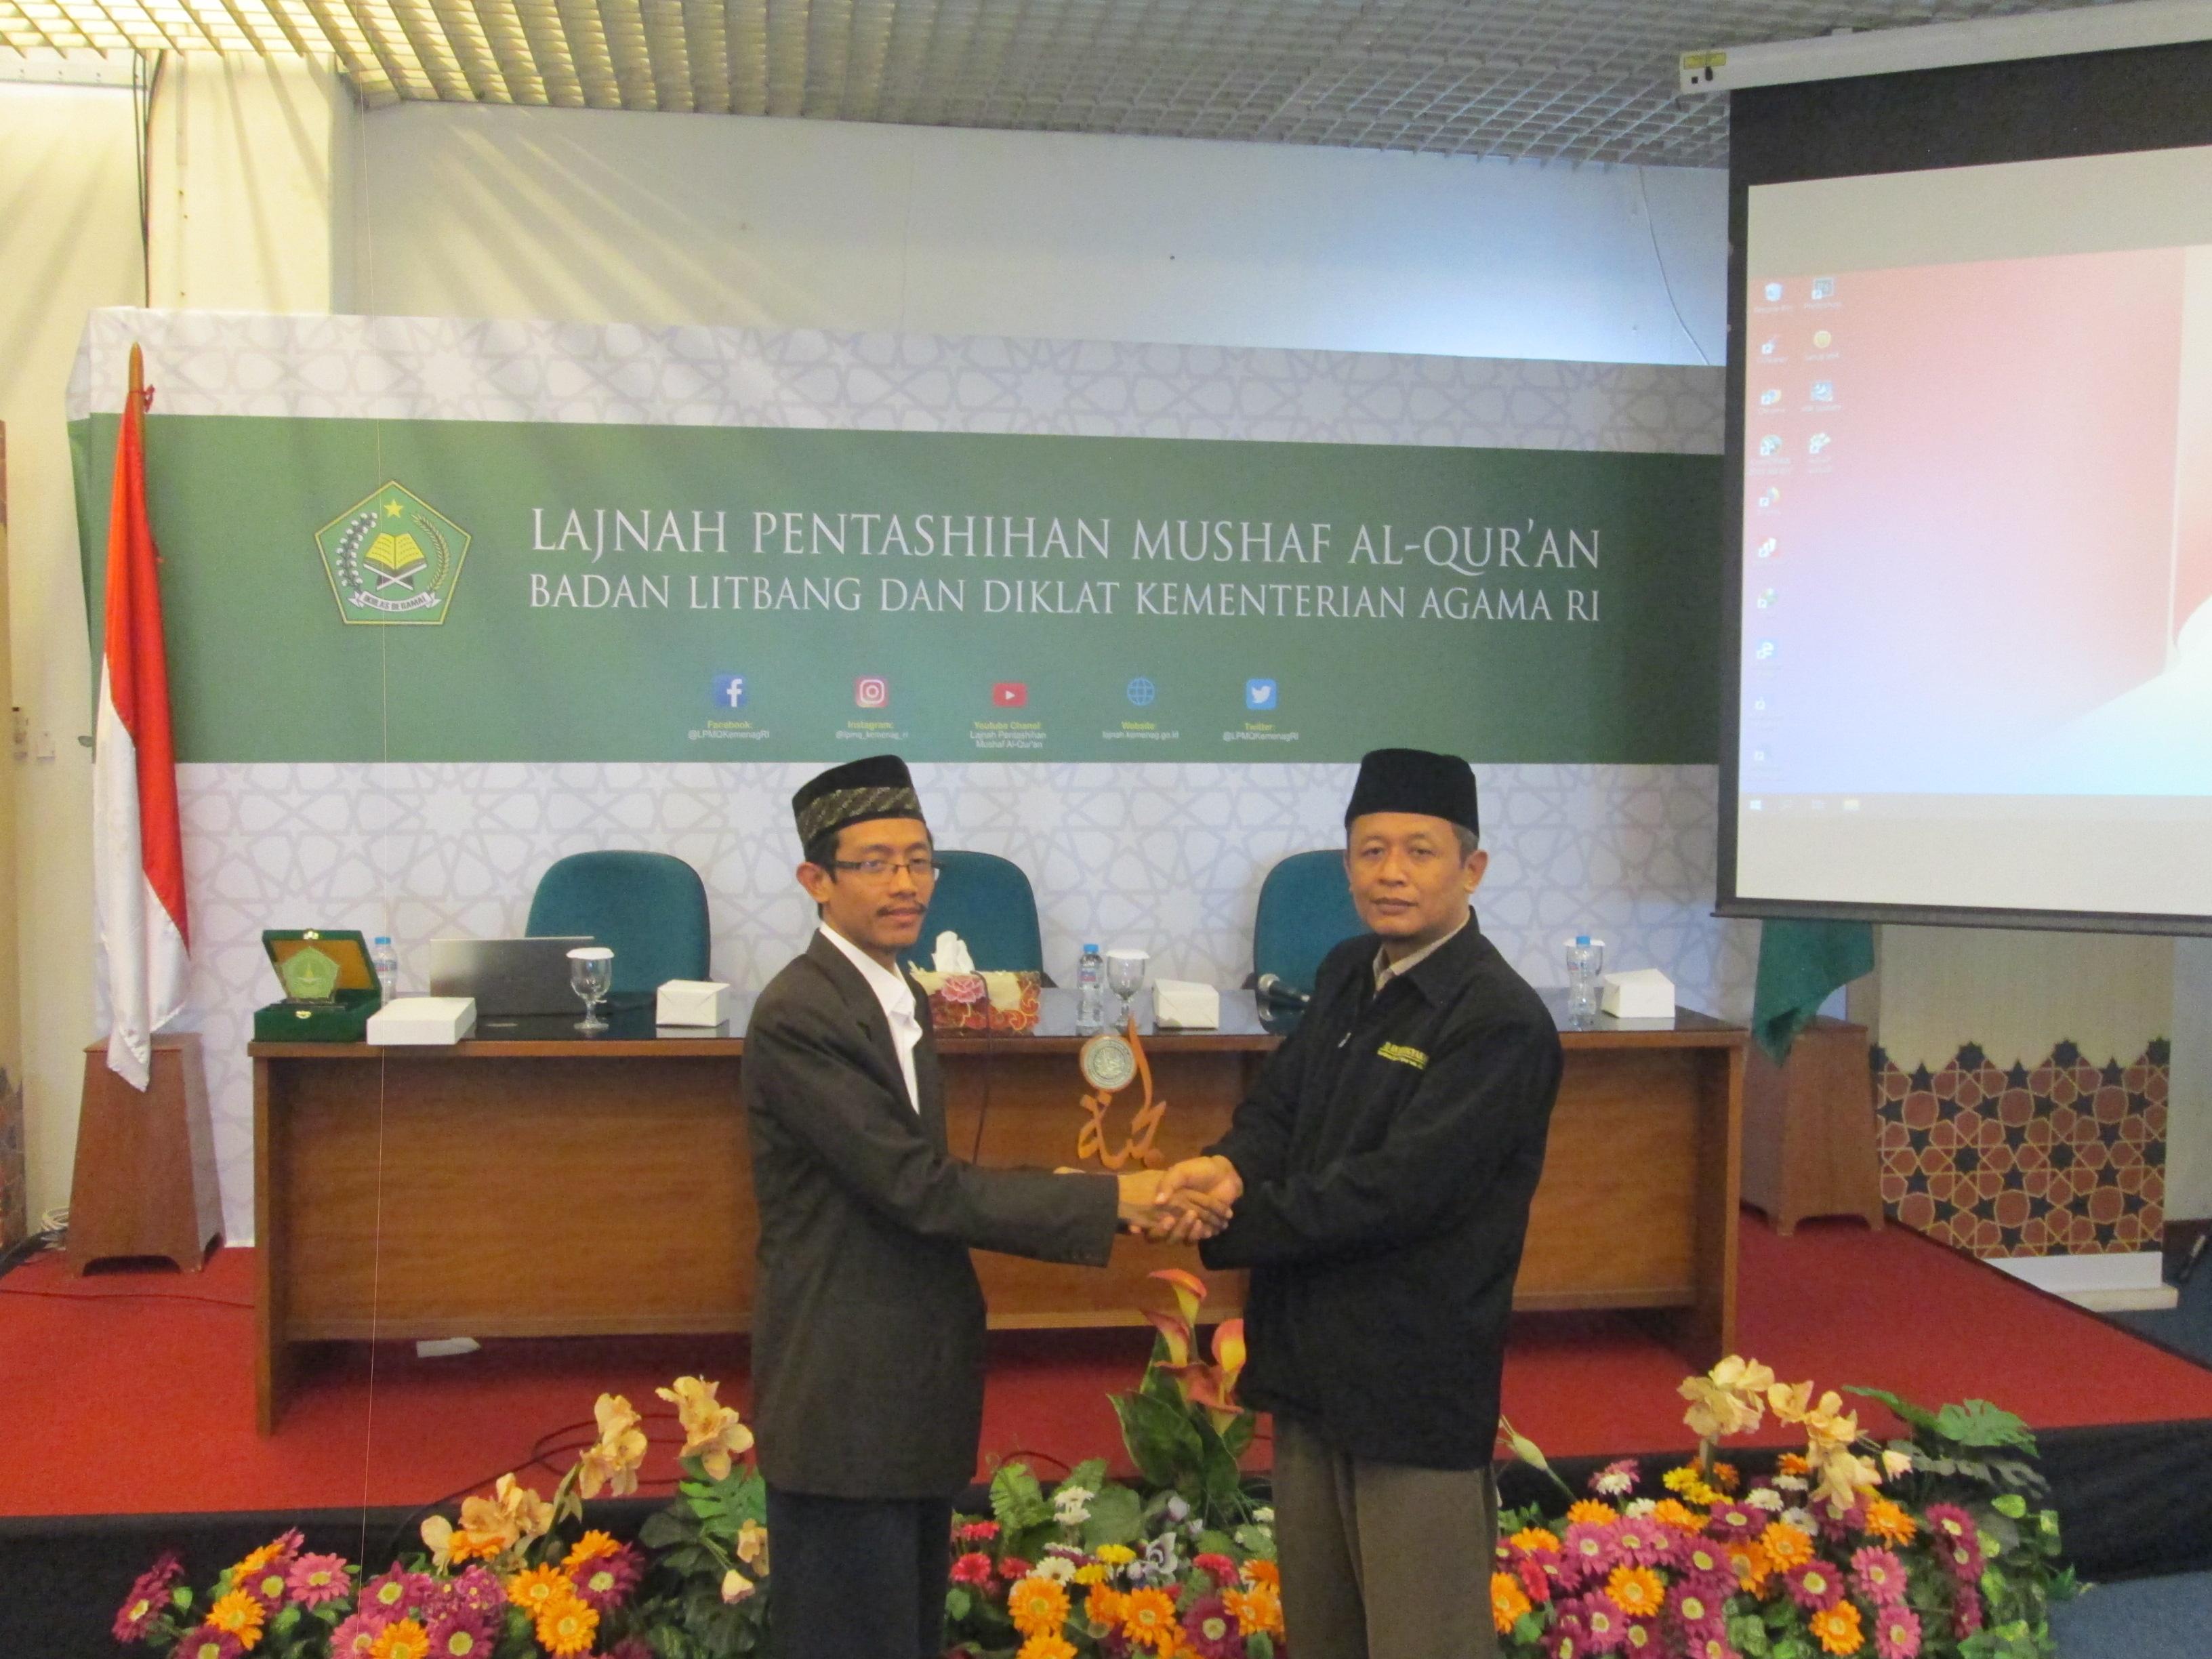 Mahasiswa Fakultas Ushuluddin IIQ An Nur Yogyakarta Praktik Tashih Dan Belajar Kajian Mushaf Al Qur'an Bersama Dewan Lajnah Pentashih Mushaf Al Qur'an Kemenag.